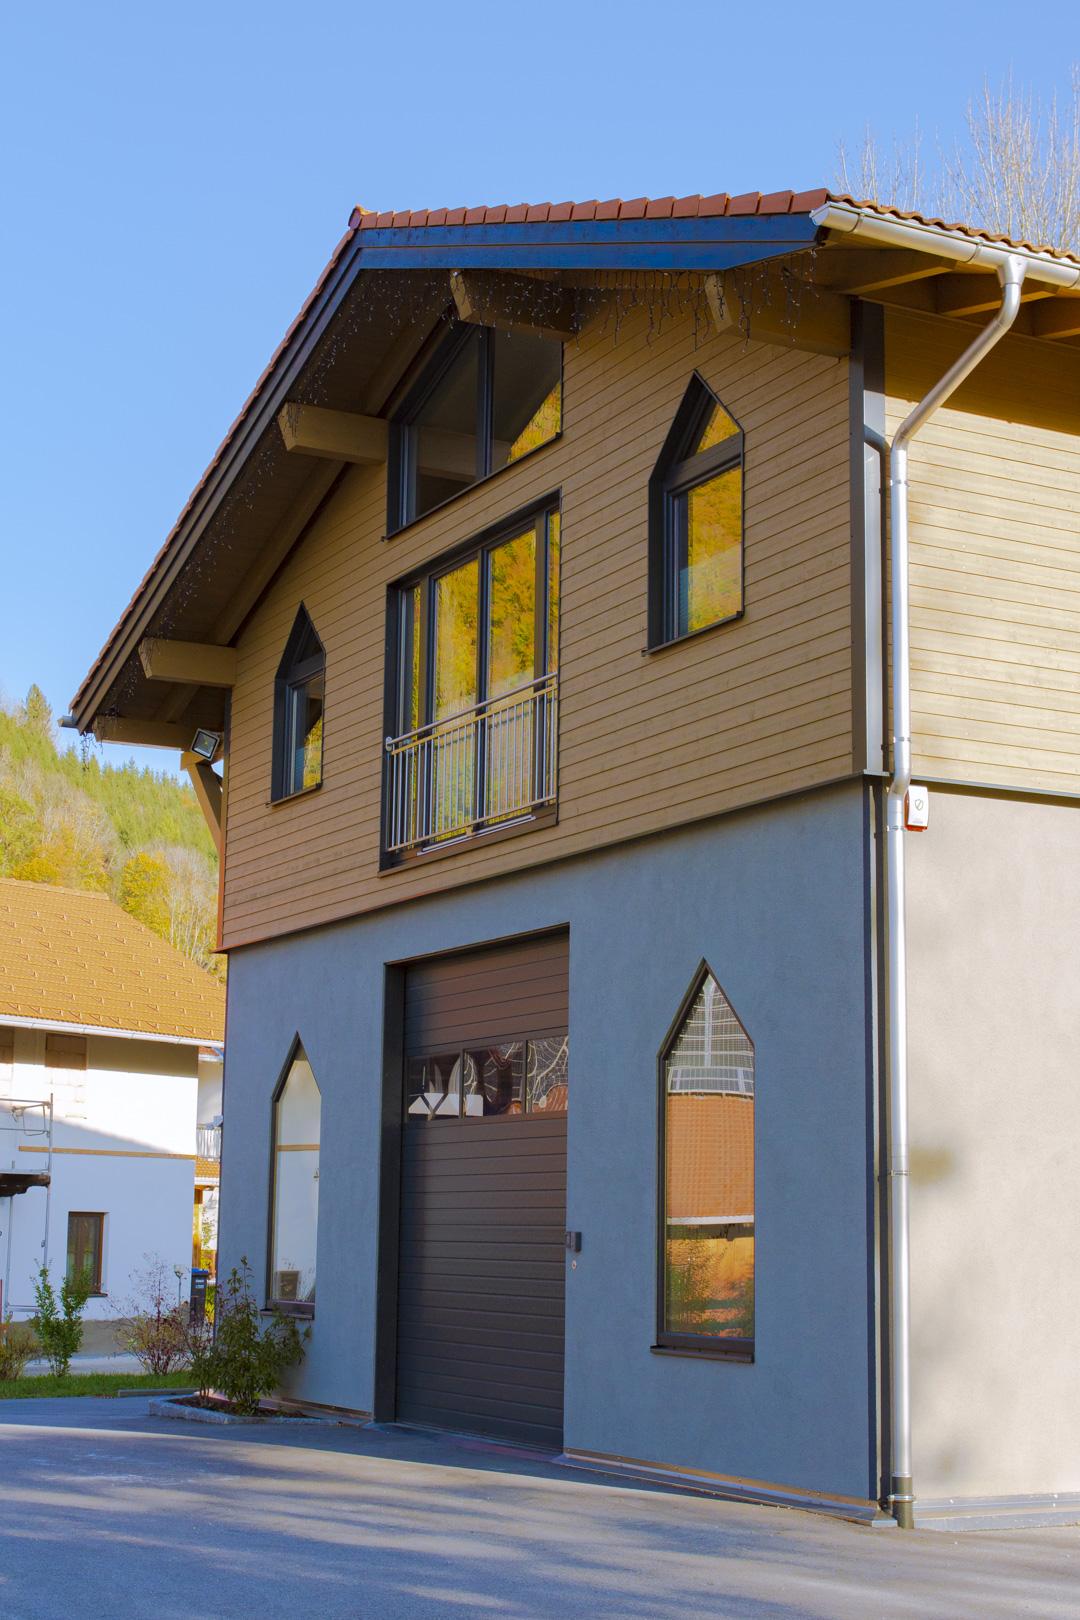 Kendler Holzhaus gewerblich Ruhpolding